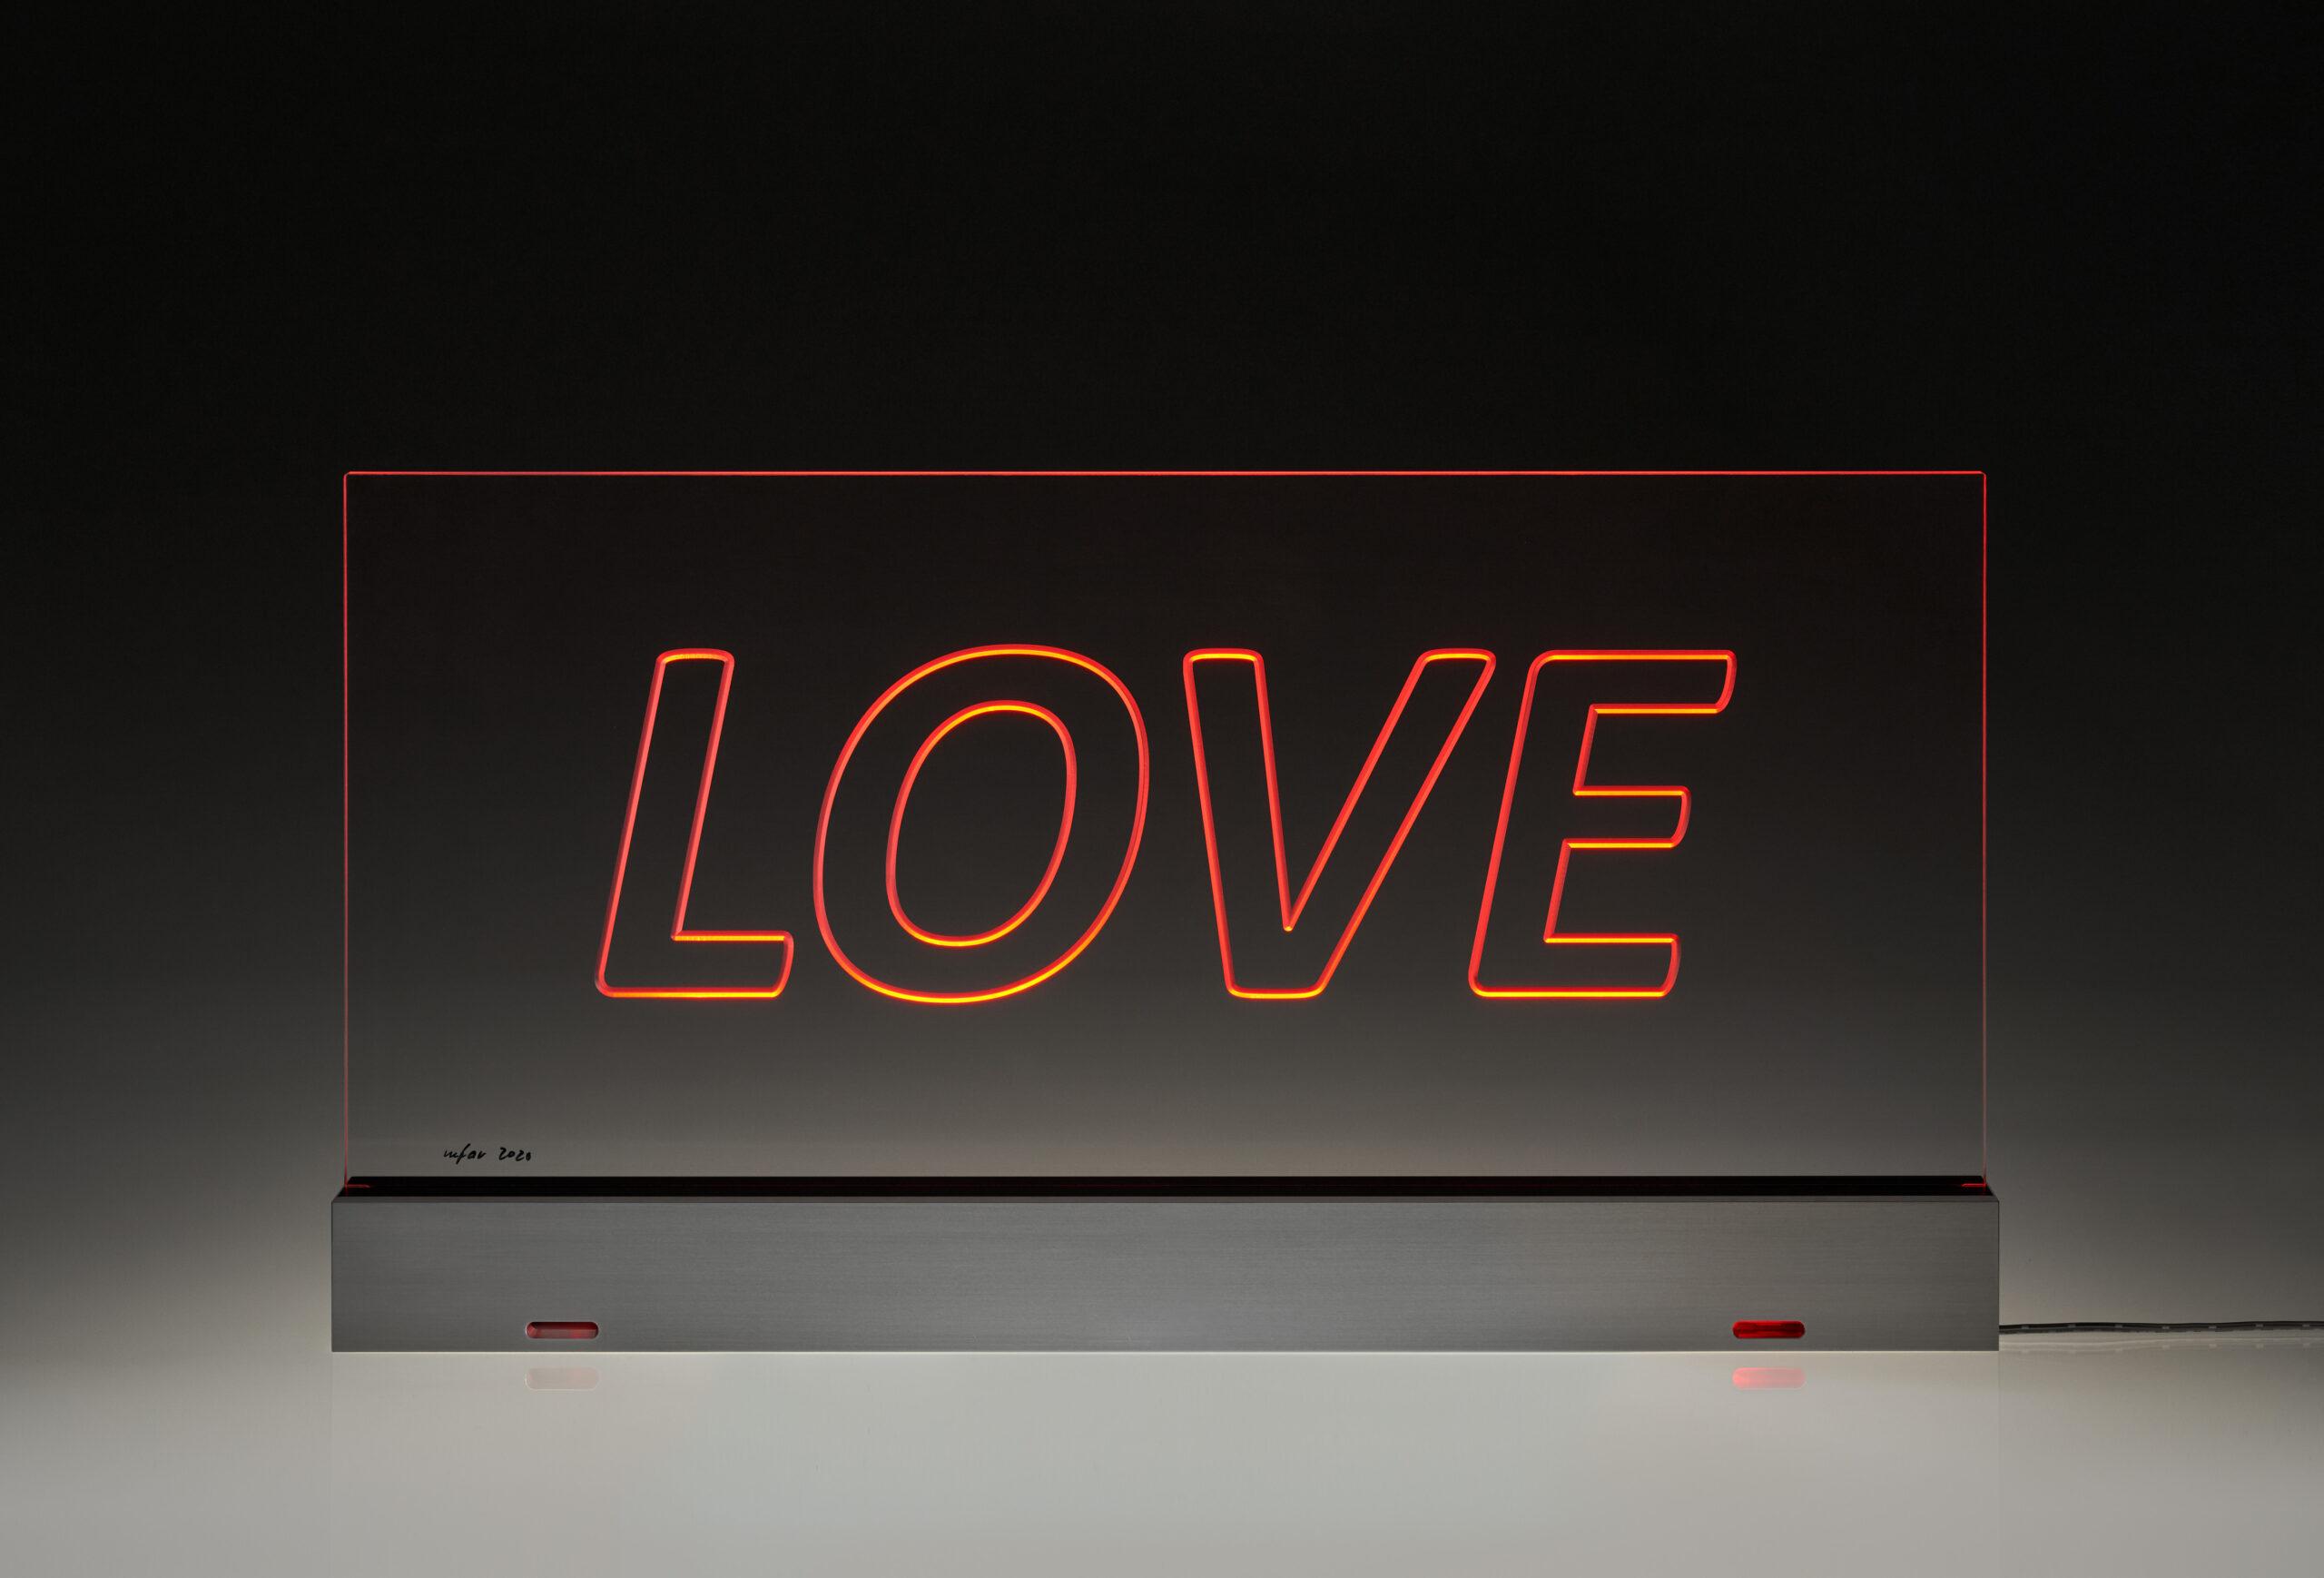 mfar_8057_LOVE_dunkel_red